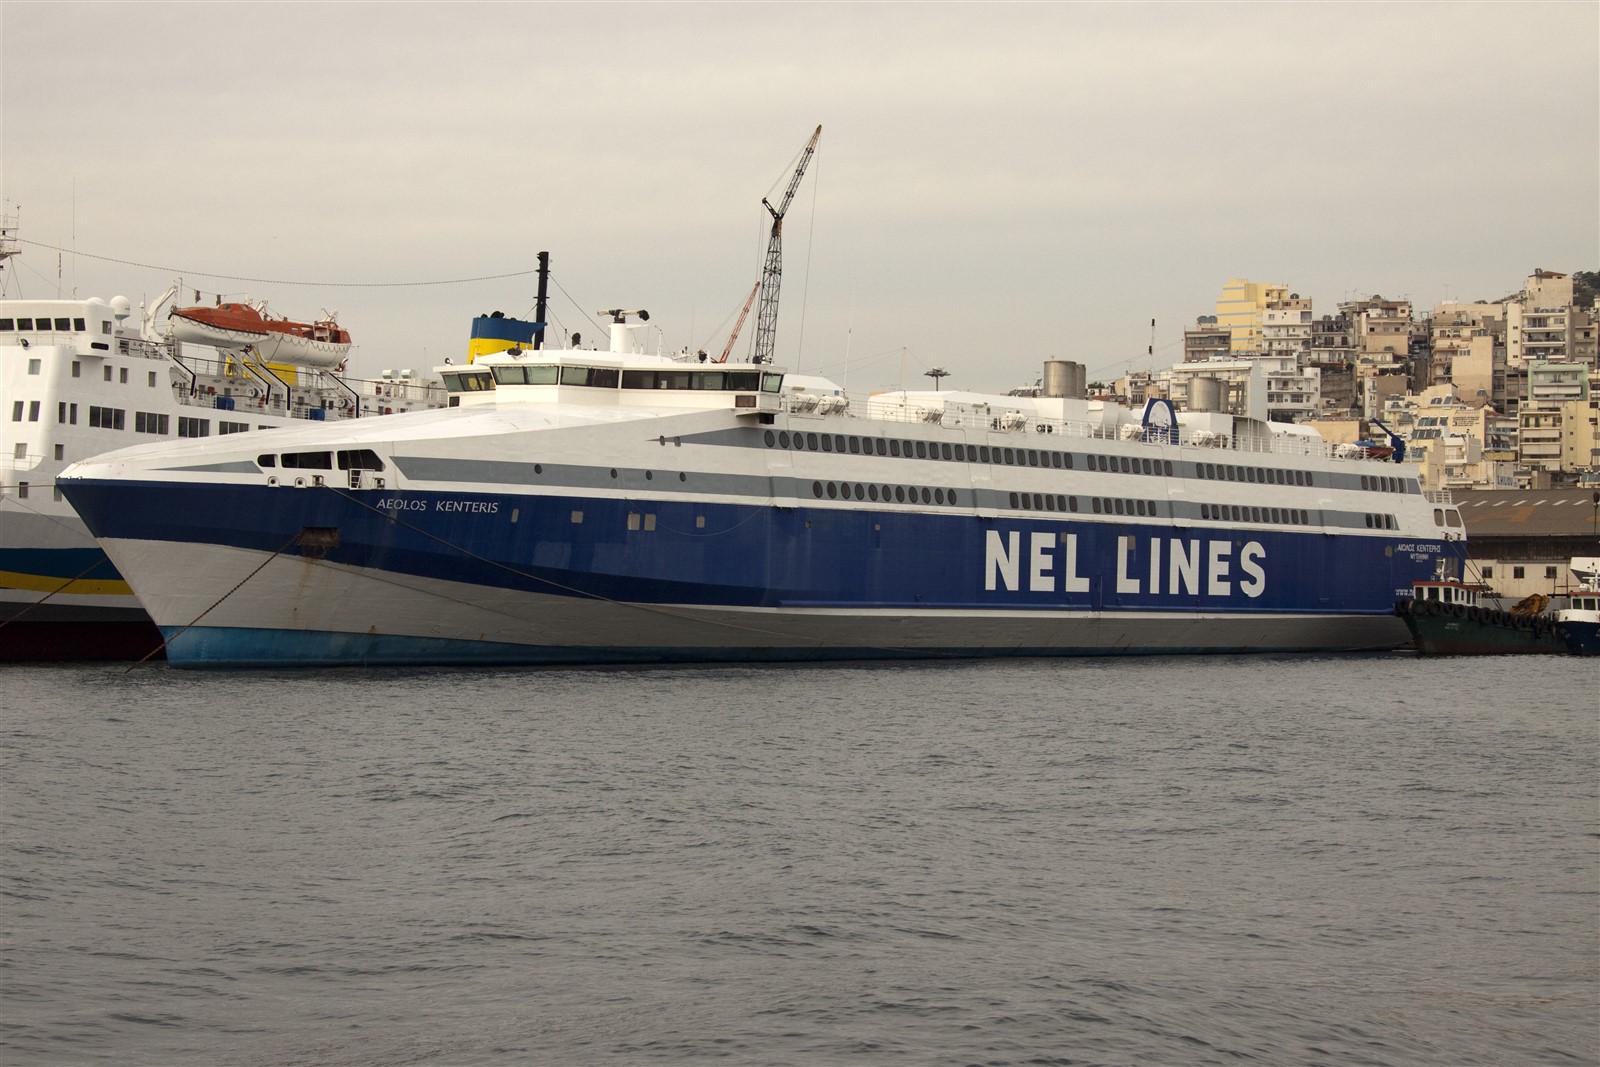 NEL LINES HSC Aeolos Kenteris 43_Personale 27Ge11